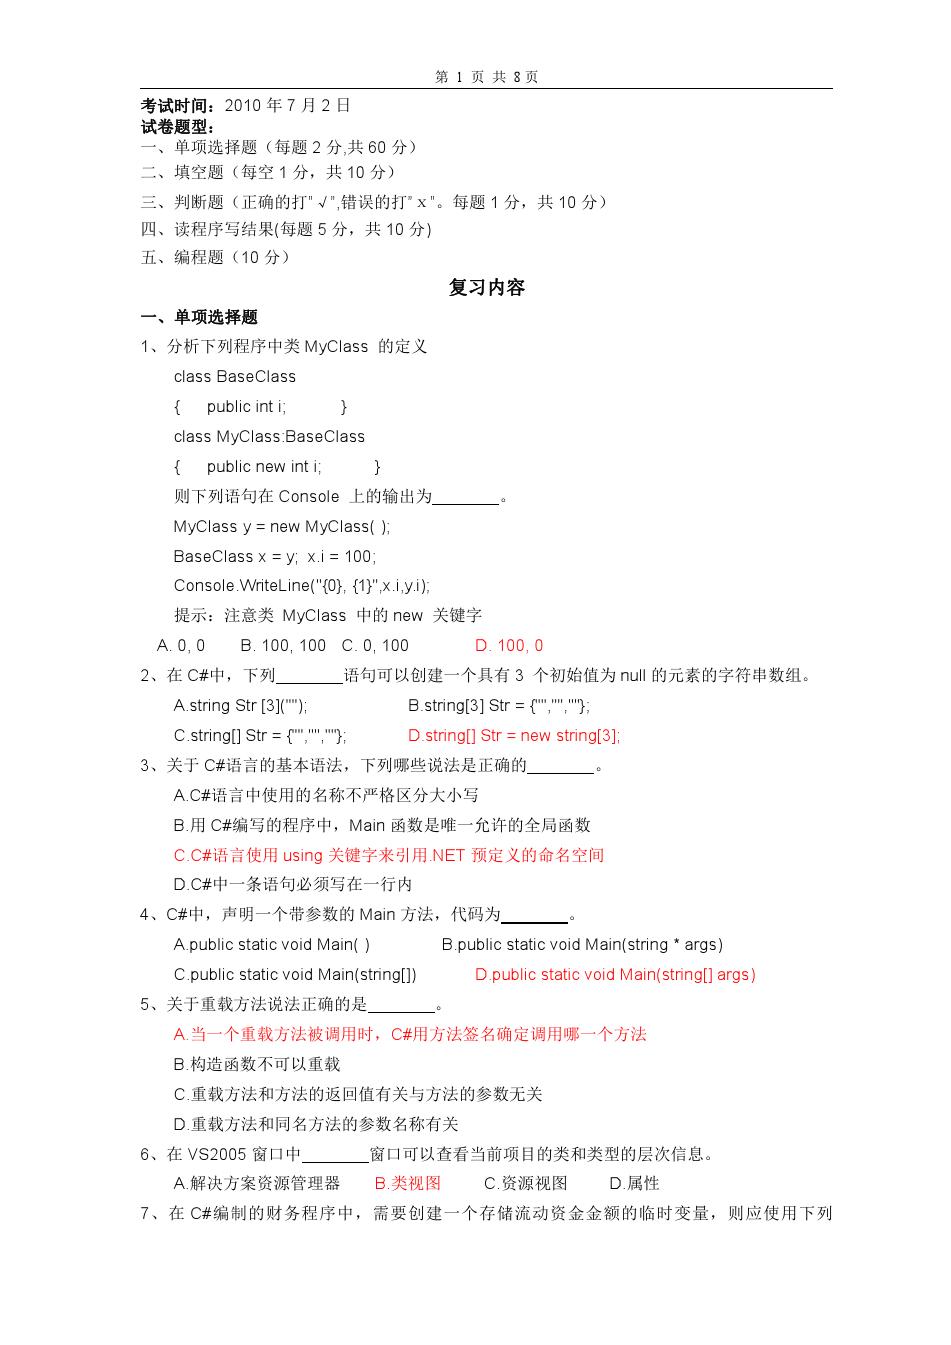 2010C#复习资料(答案)